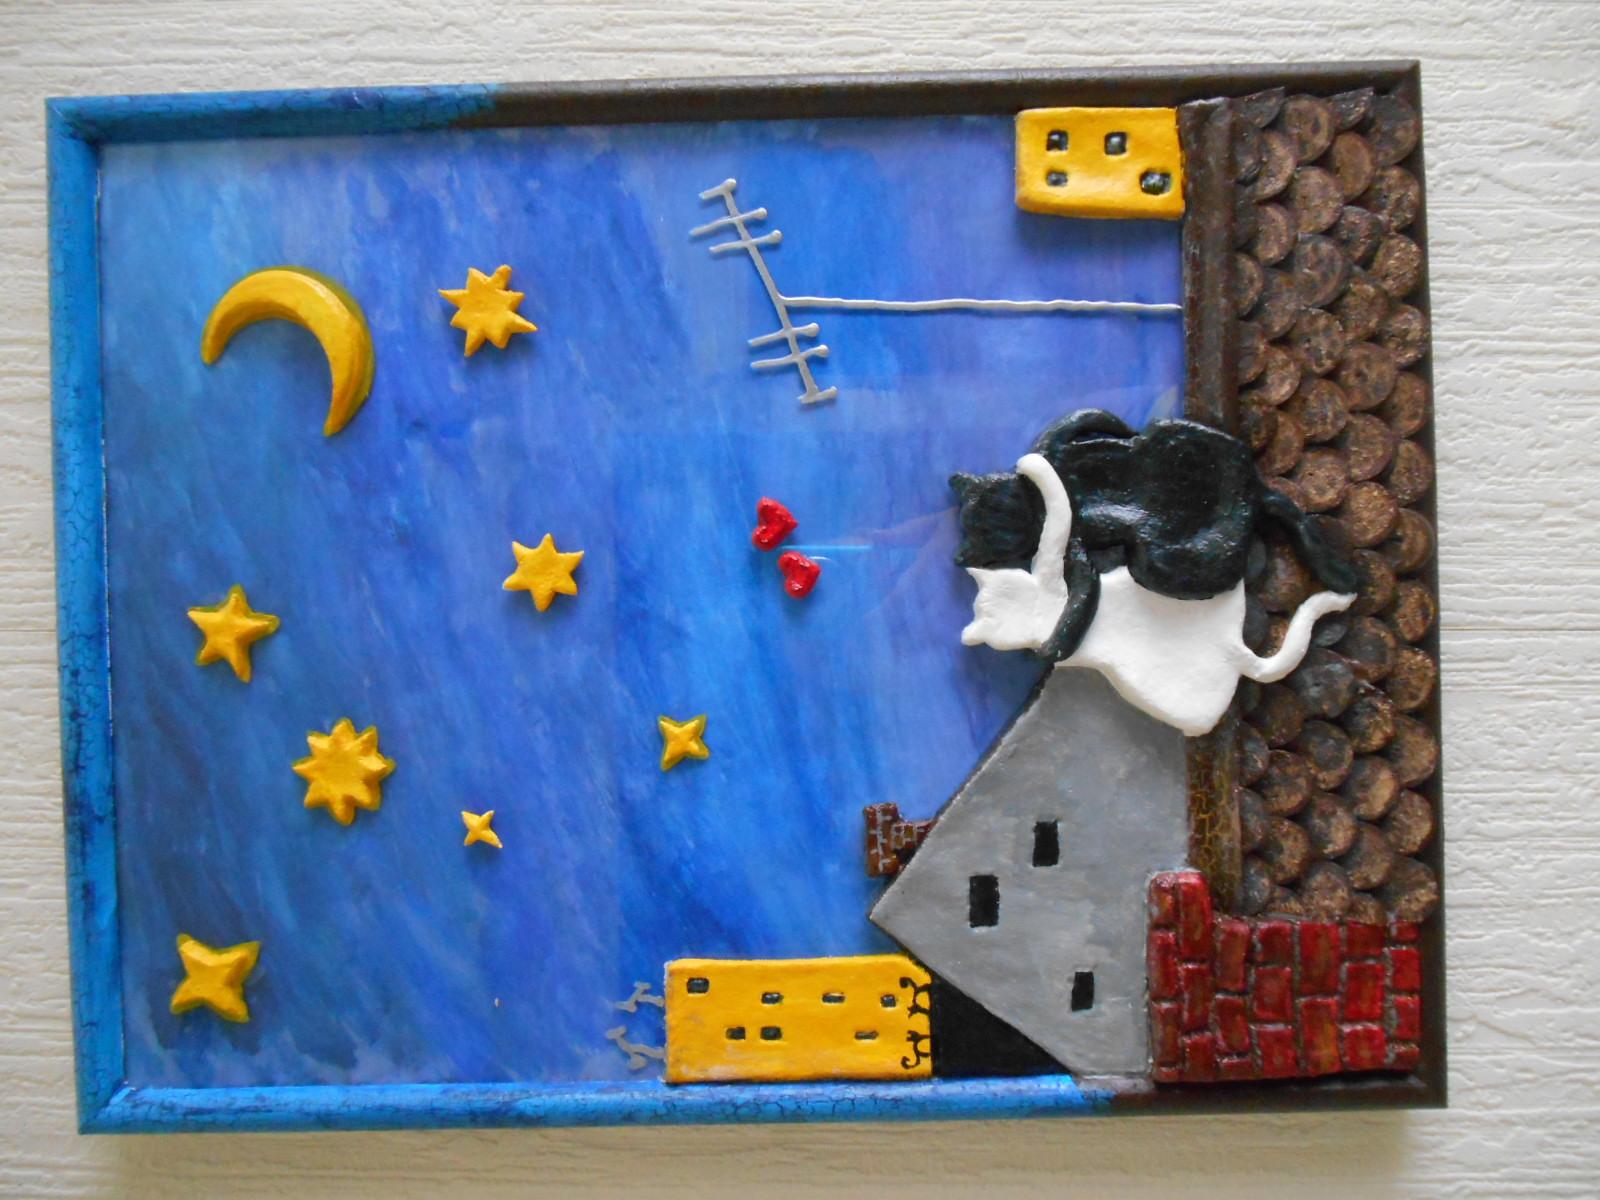 Композиция из биокерамики: Кот и мыши. Фото №1